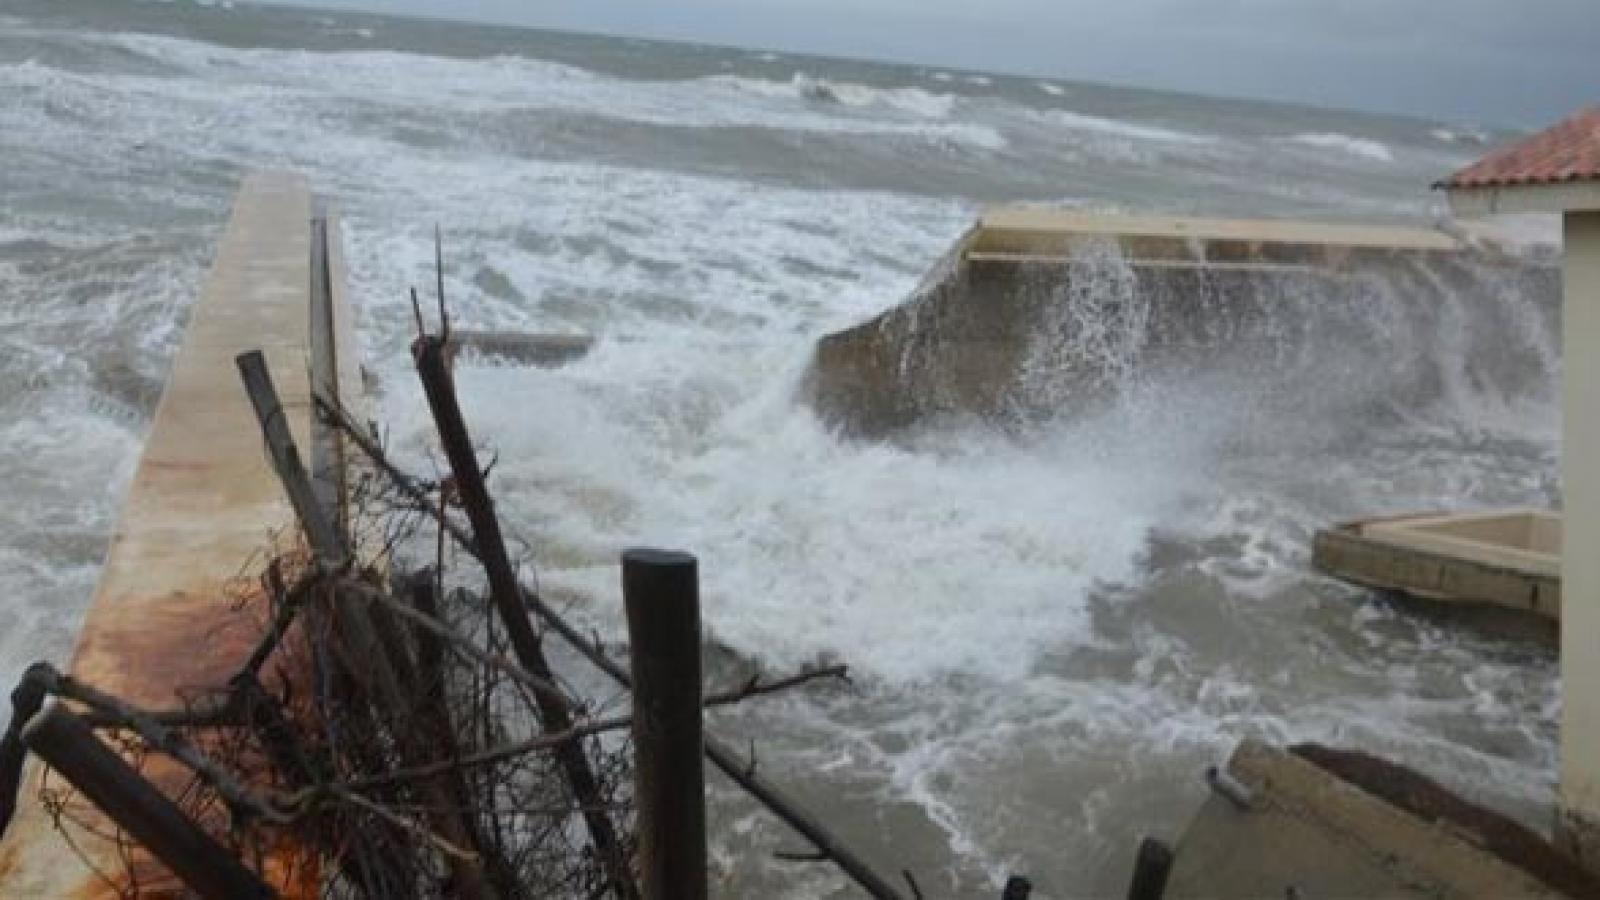 Cua Dai Beach disappearing because of erosion